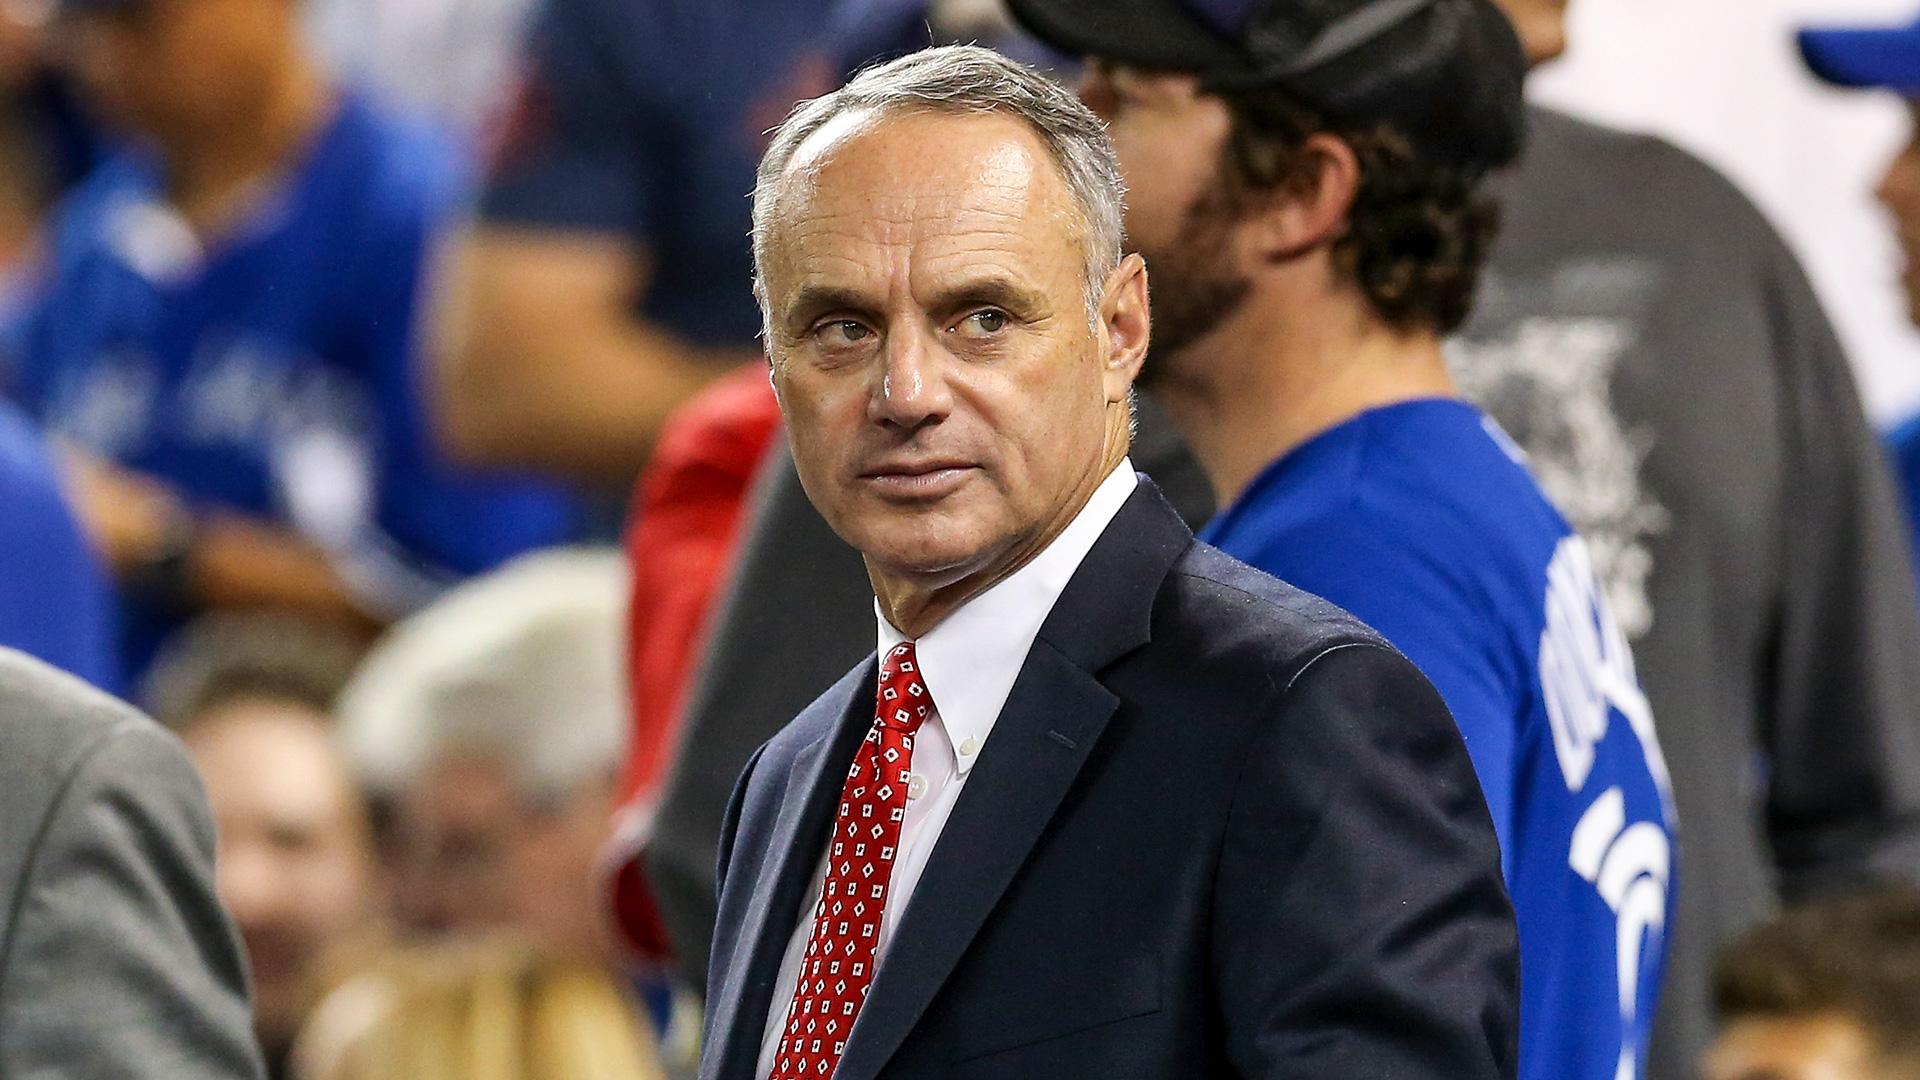 El comisionado de la MLB, Rob Manfred, parece odiar el béisbol 2